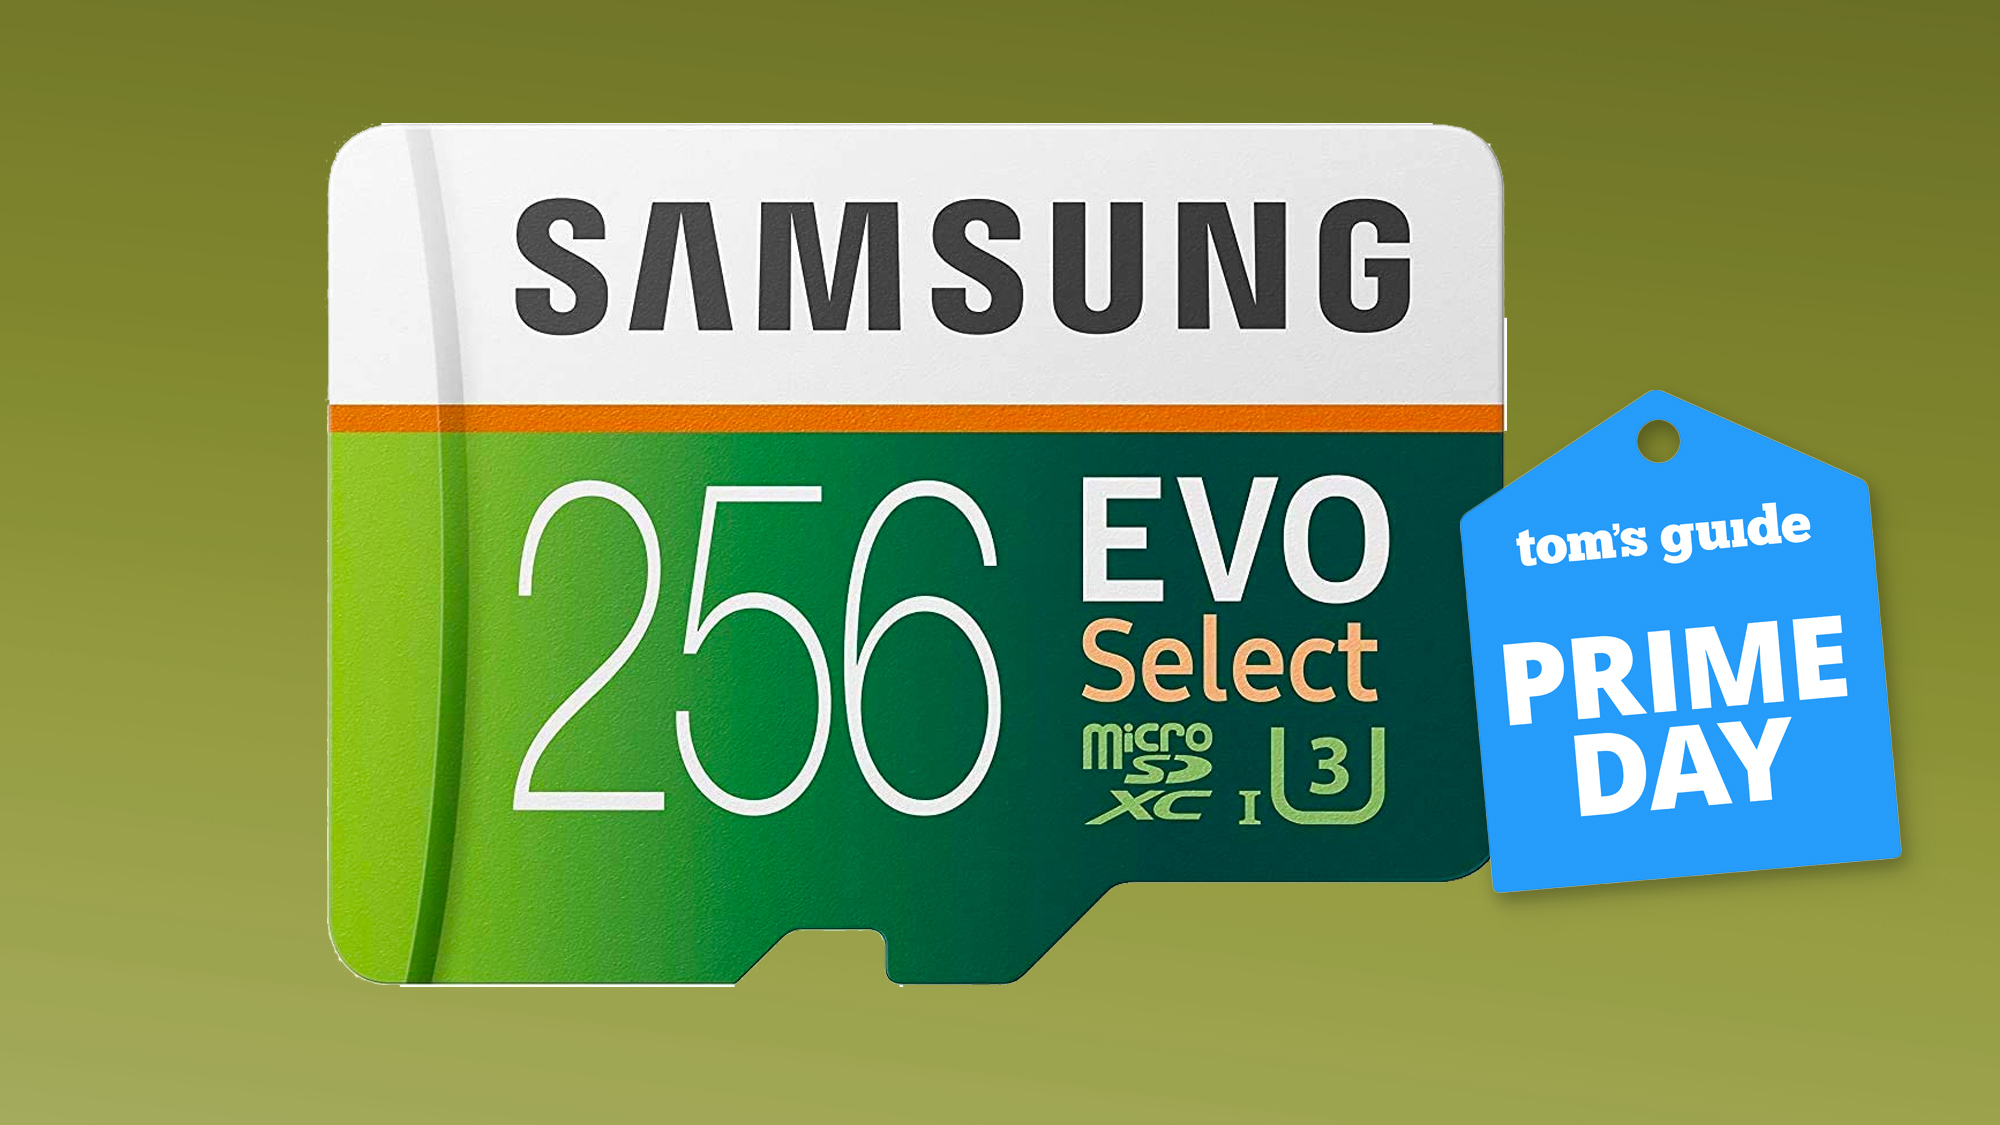 Samsung EVO microSD card Prime Day deal